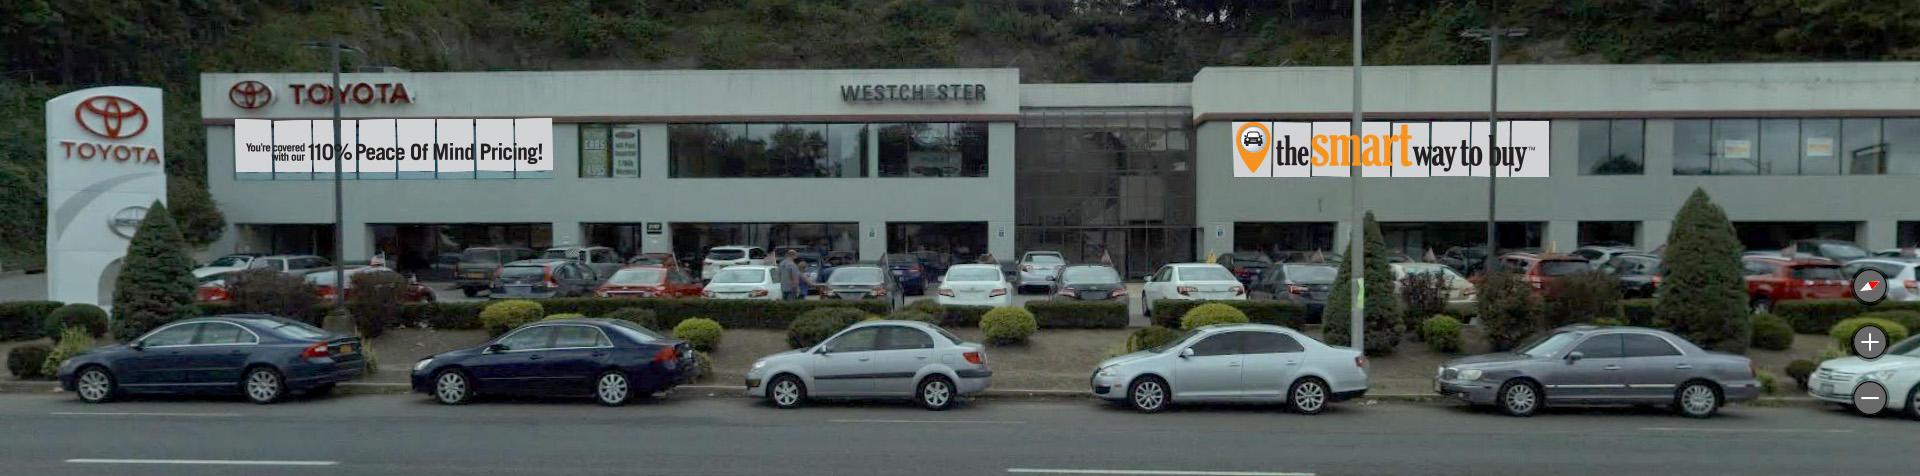 Westchester Toyota image 0